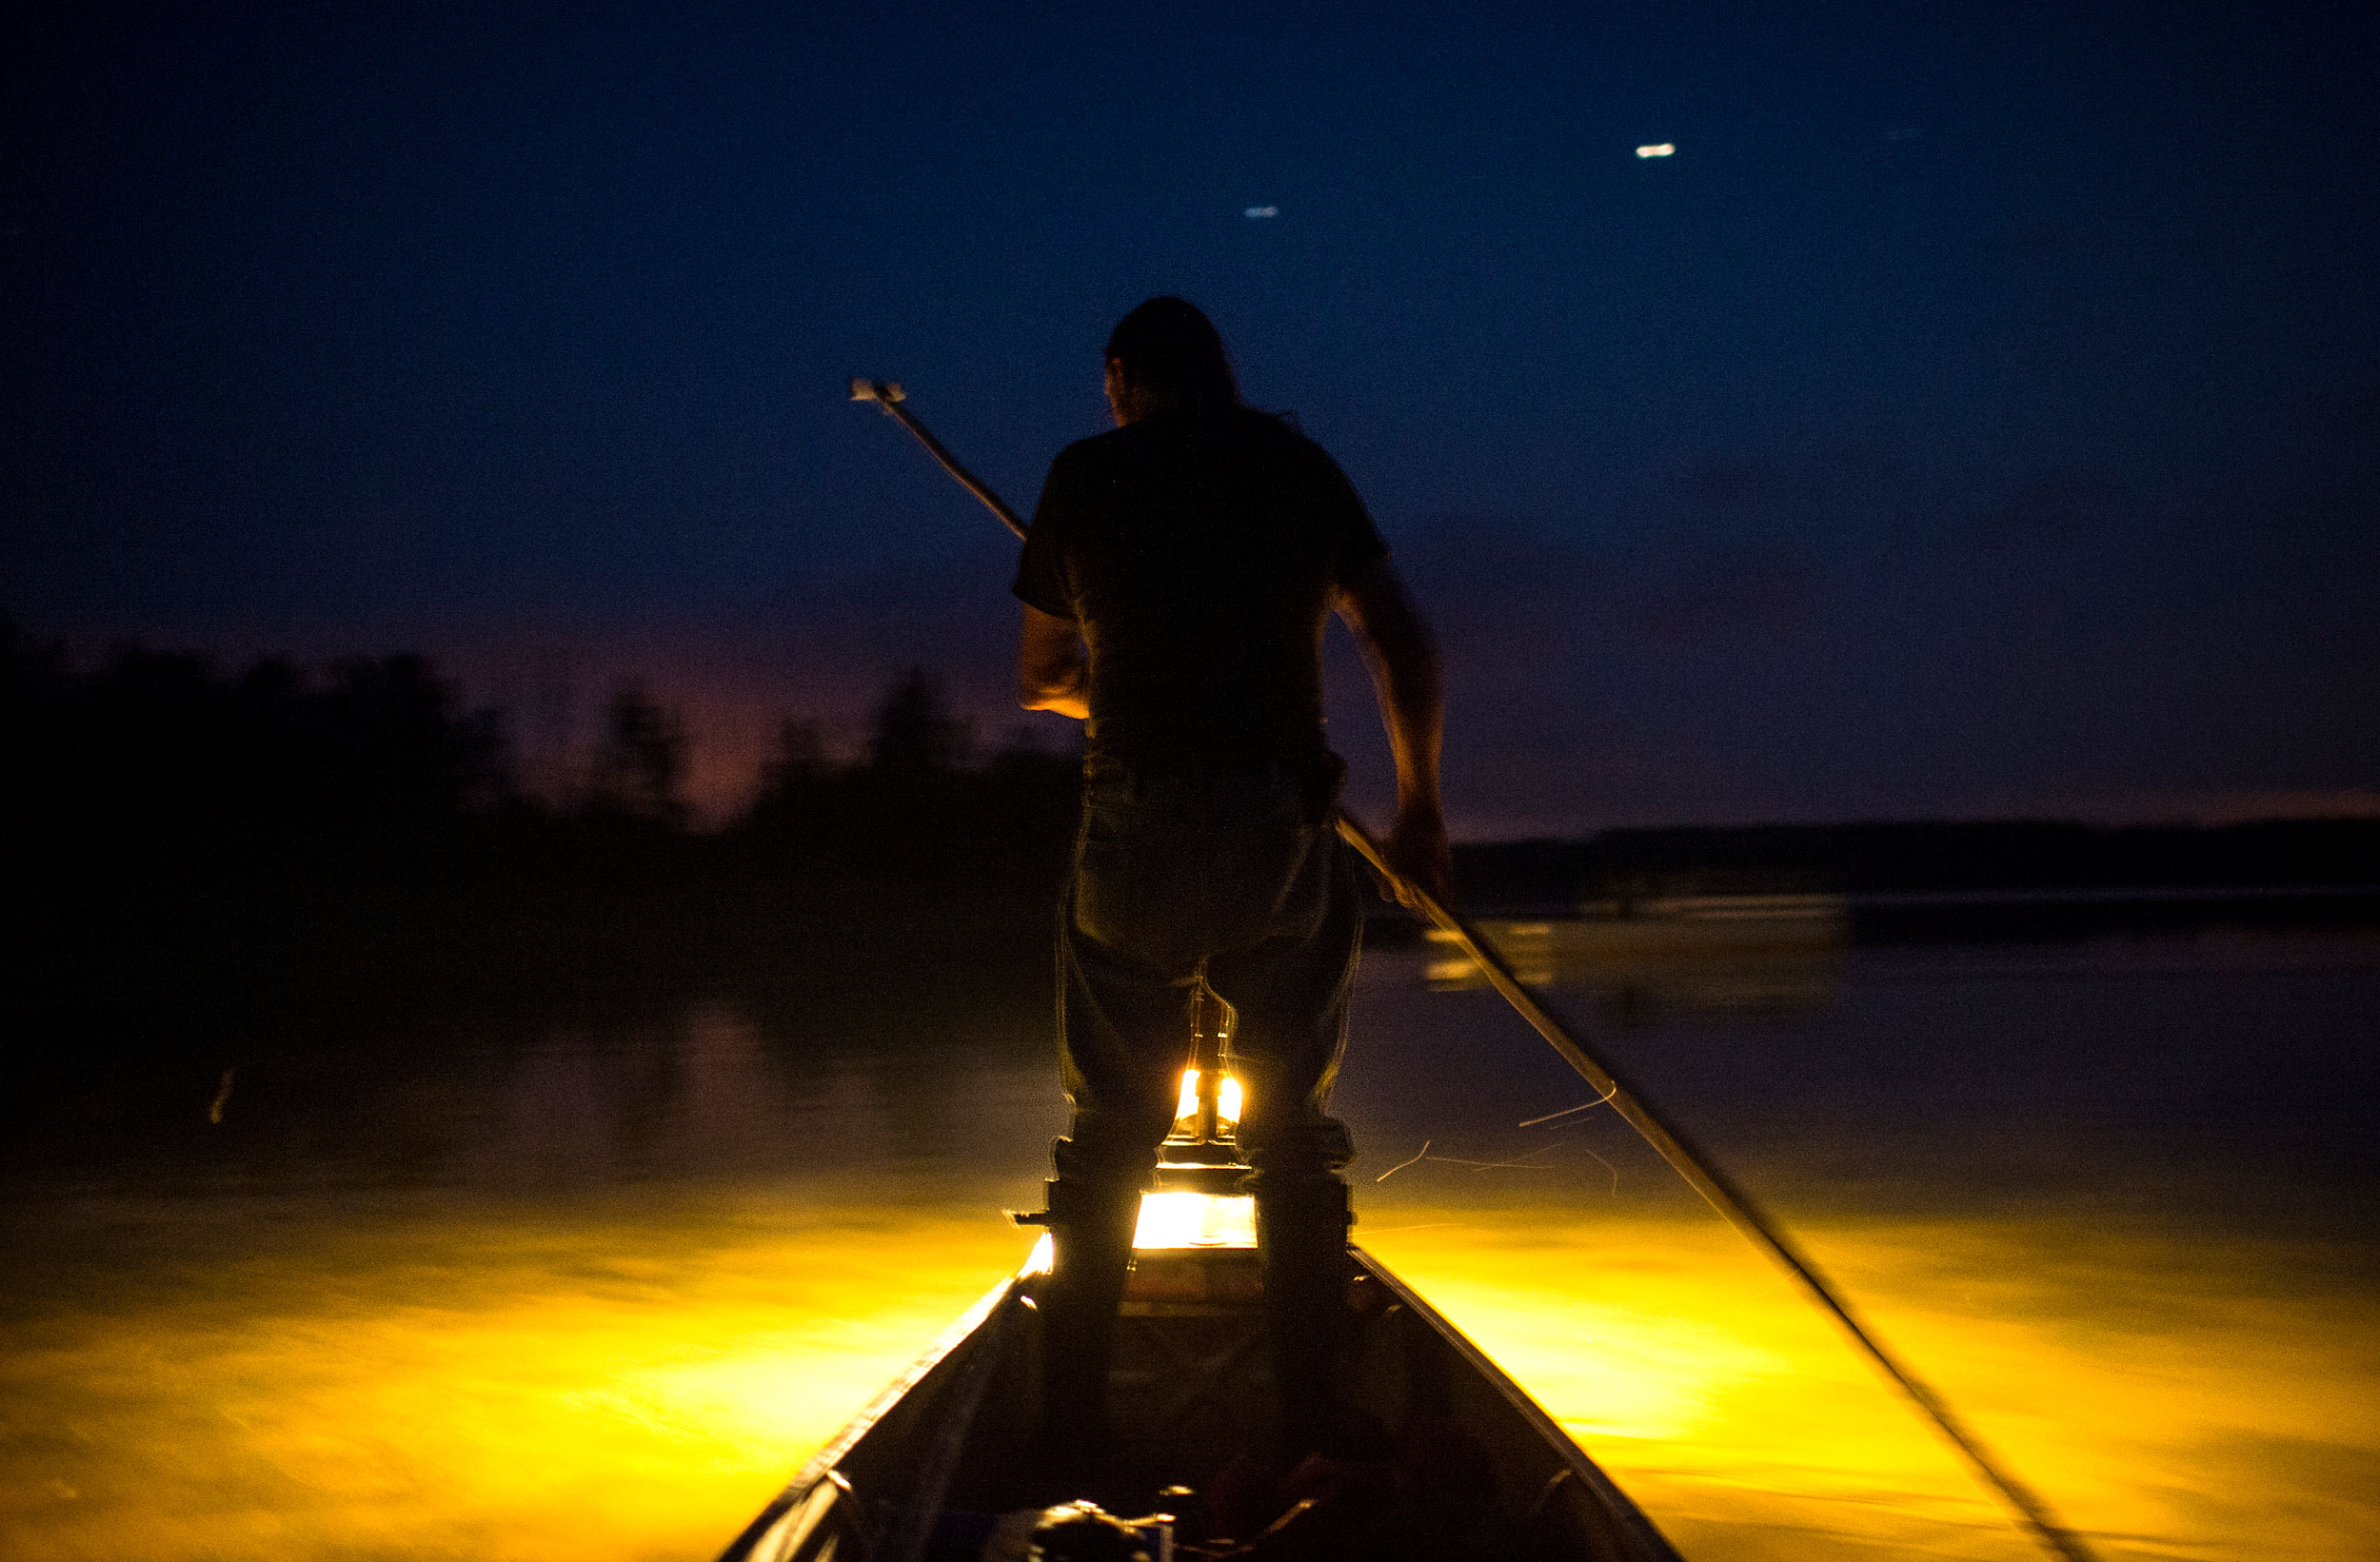 Prosper navigates Pomquet Harbour with light from a lantern